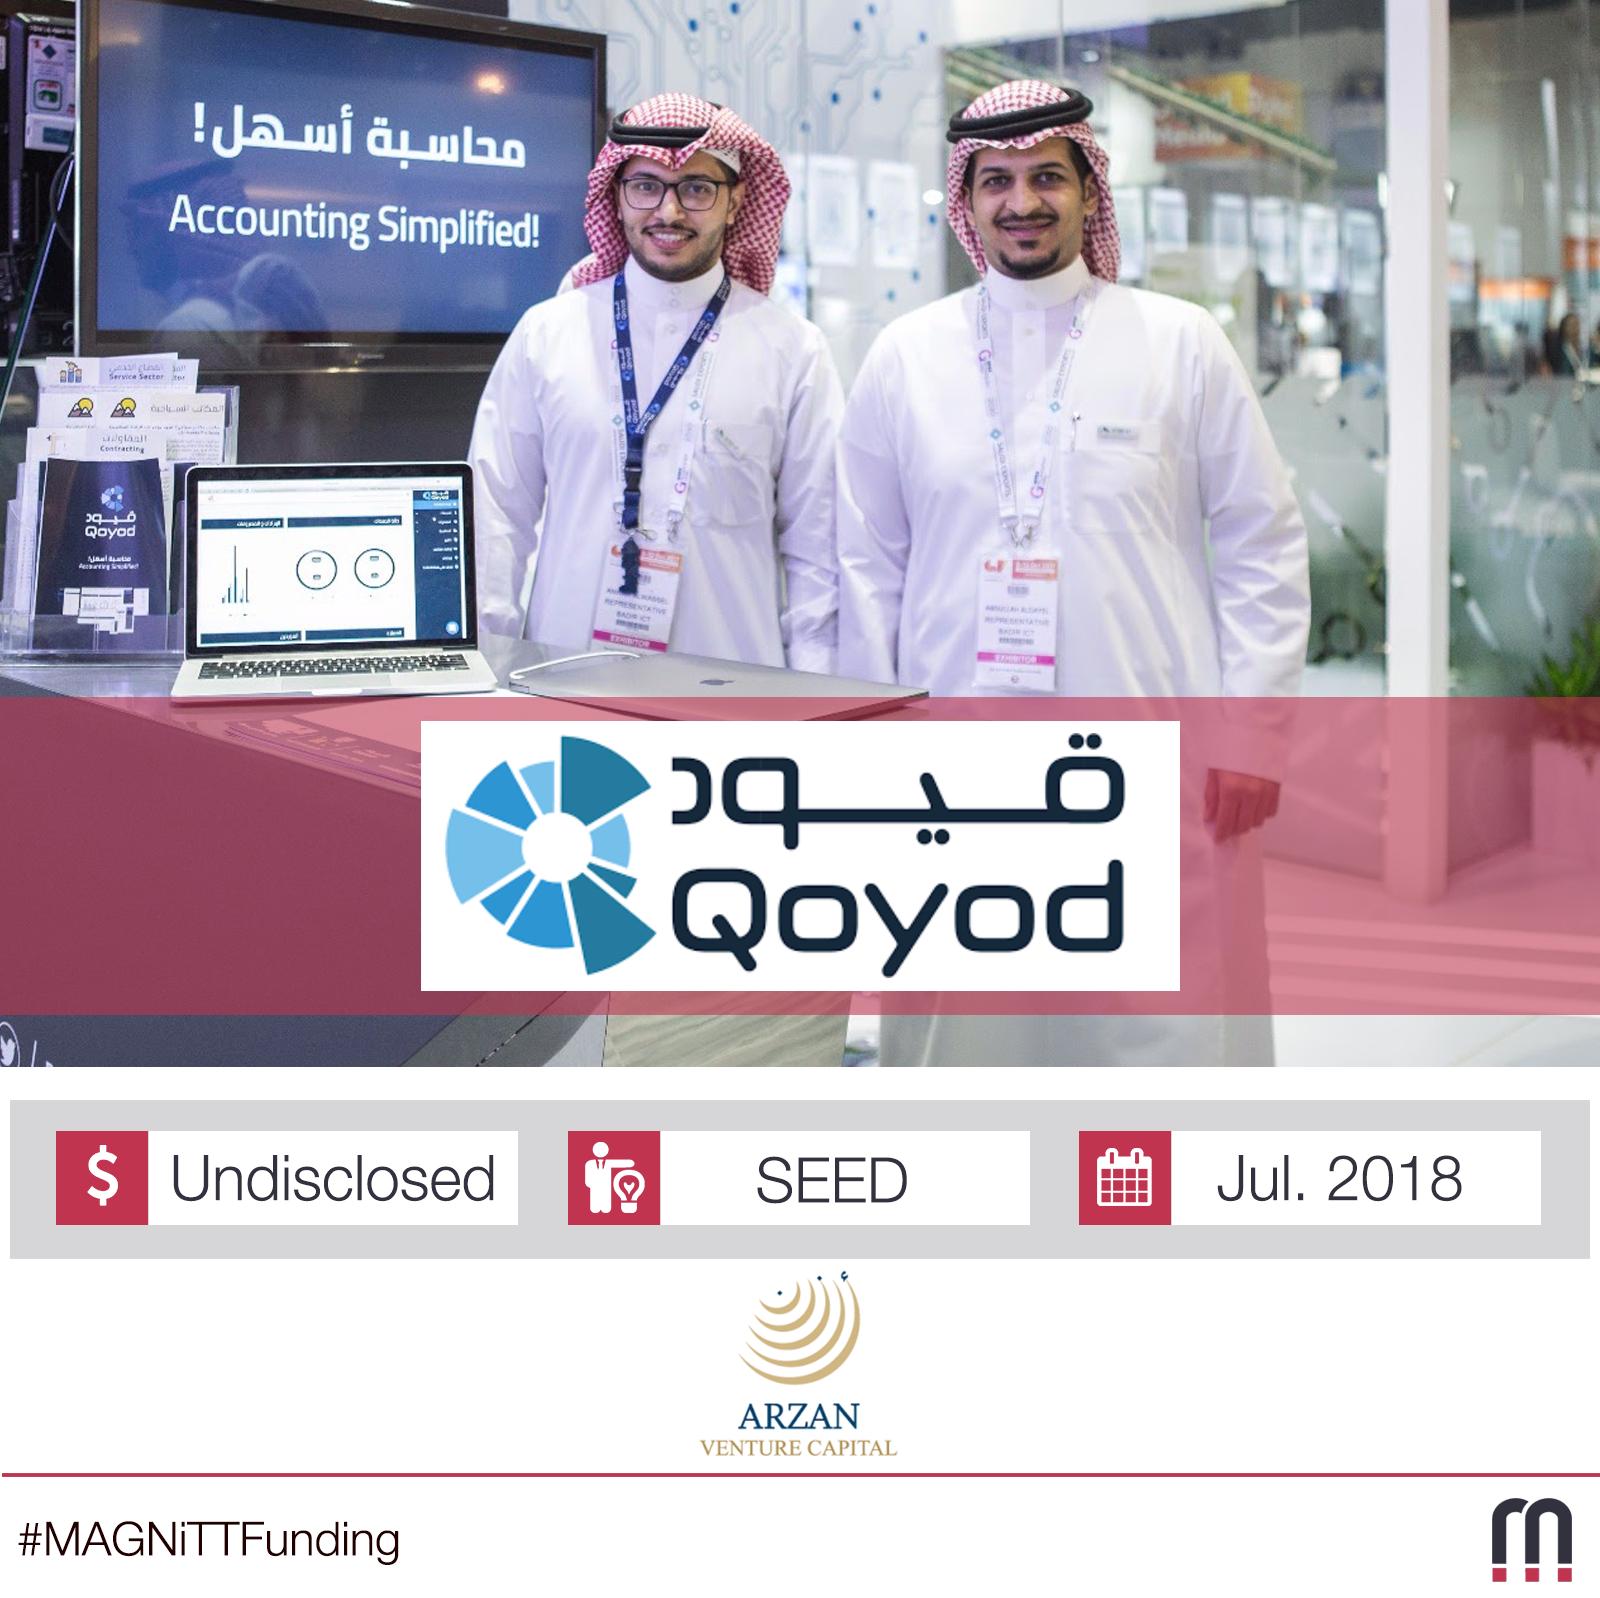 Saudi Arabian Startup Qoyod Closes SEED Funding Round